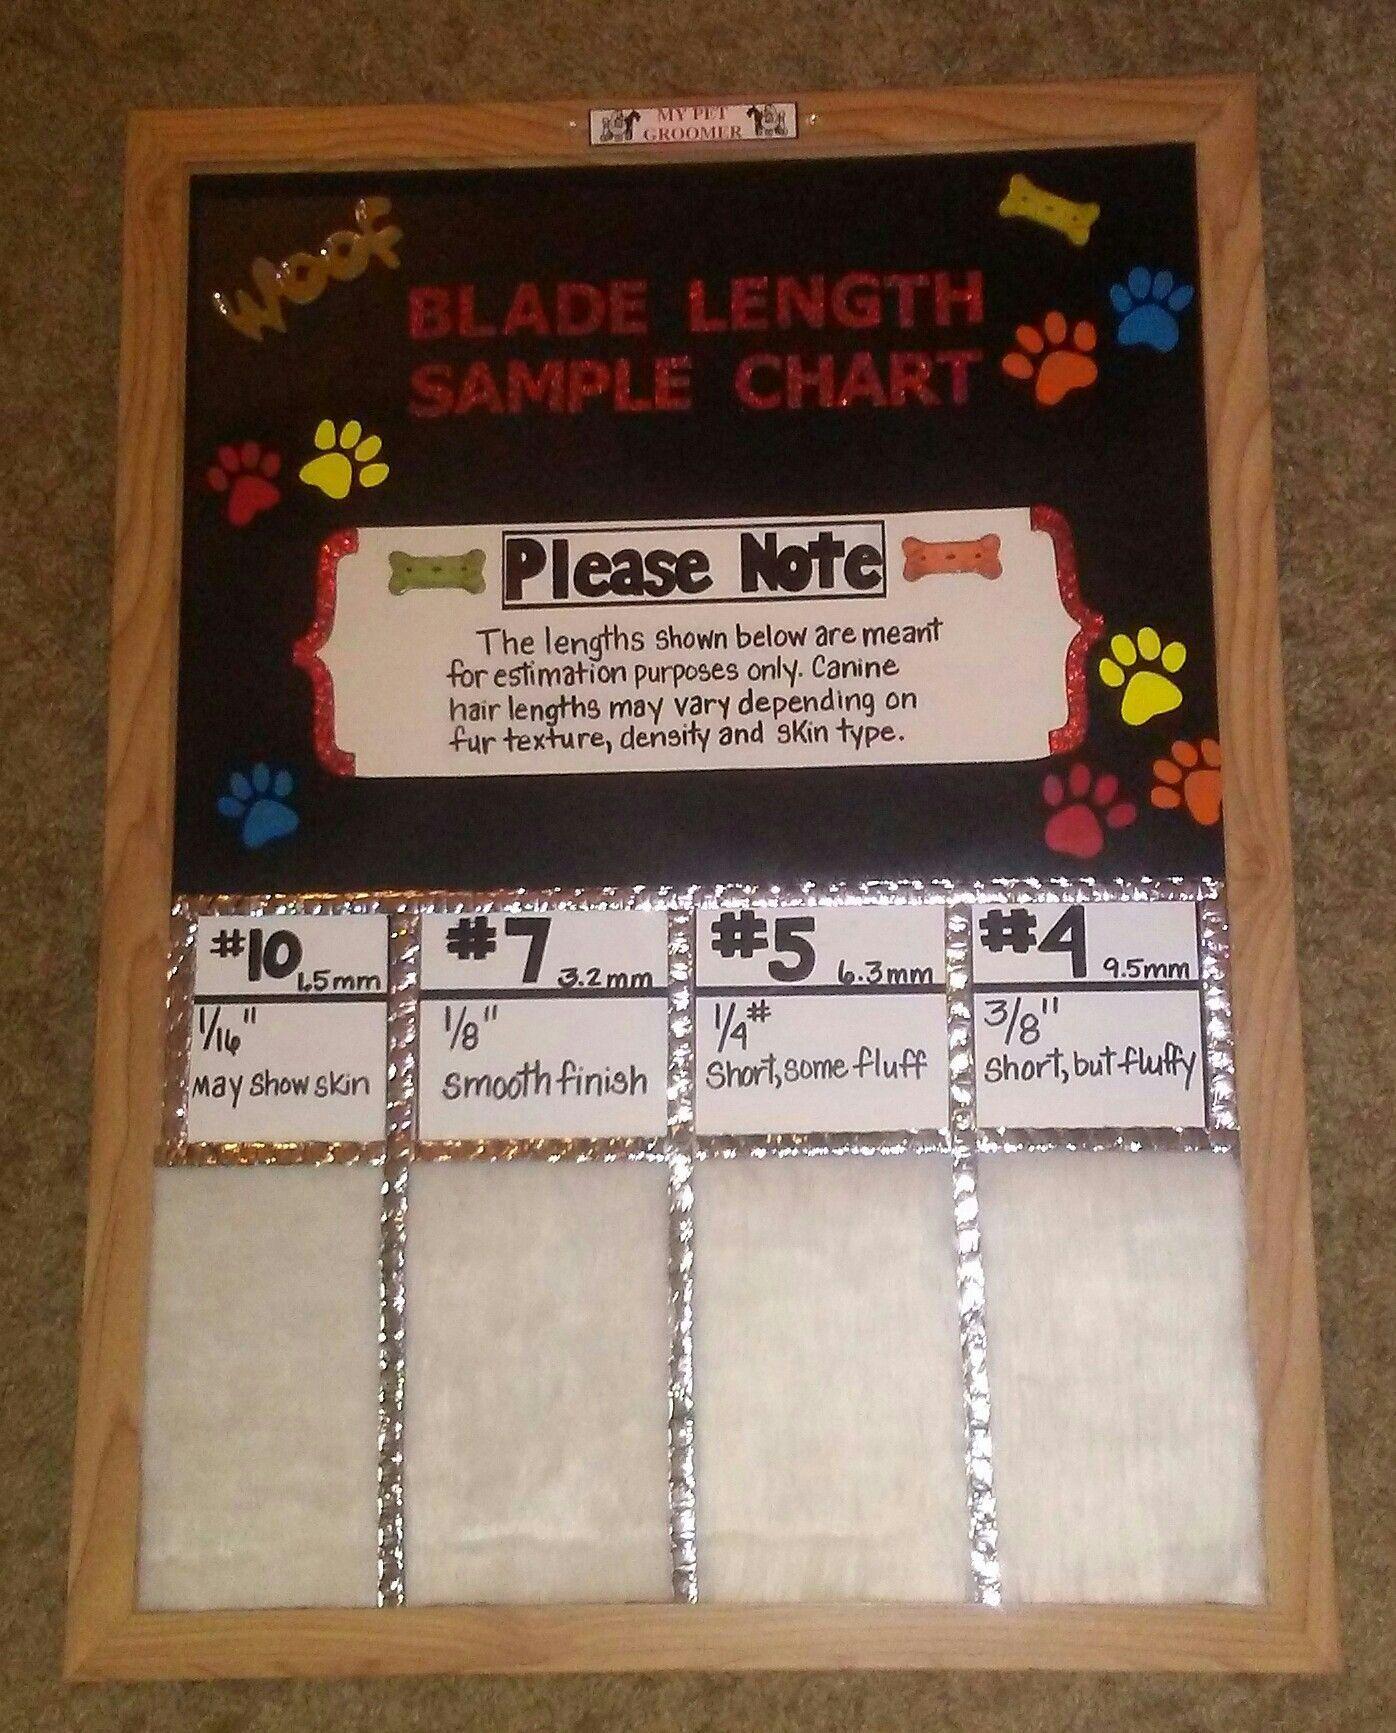 Blade Length Sample Chart For Dog Grooming Doggroomingtips Pet Grooming Business Dog Grooming Salons Dog Grooming Shop